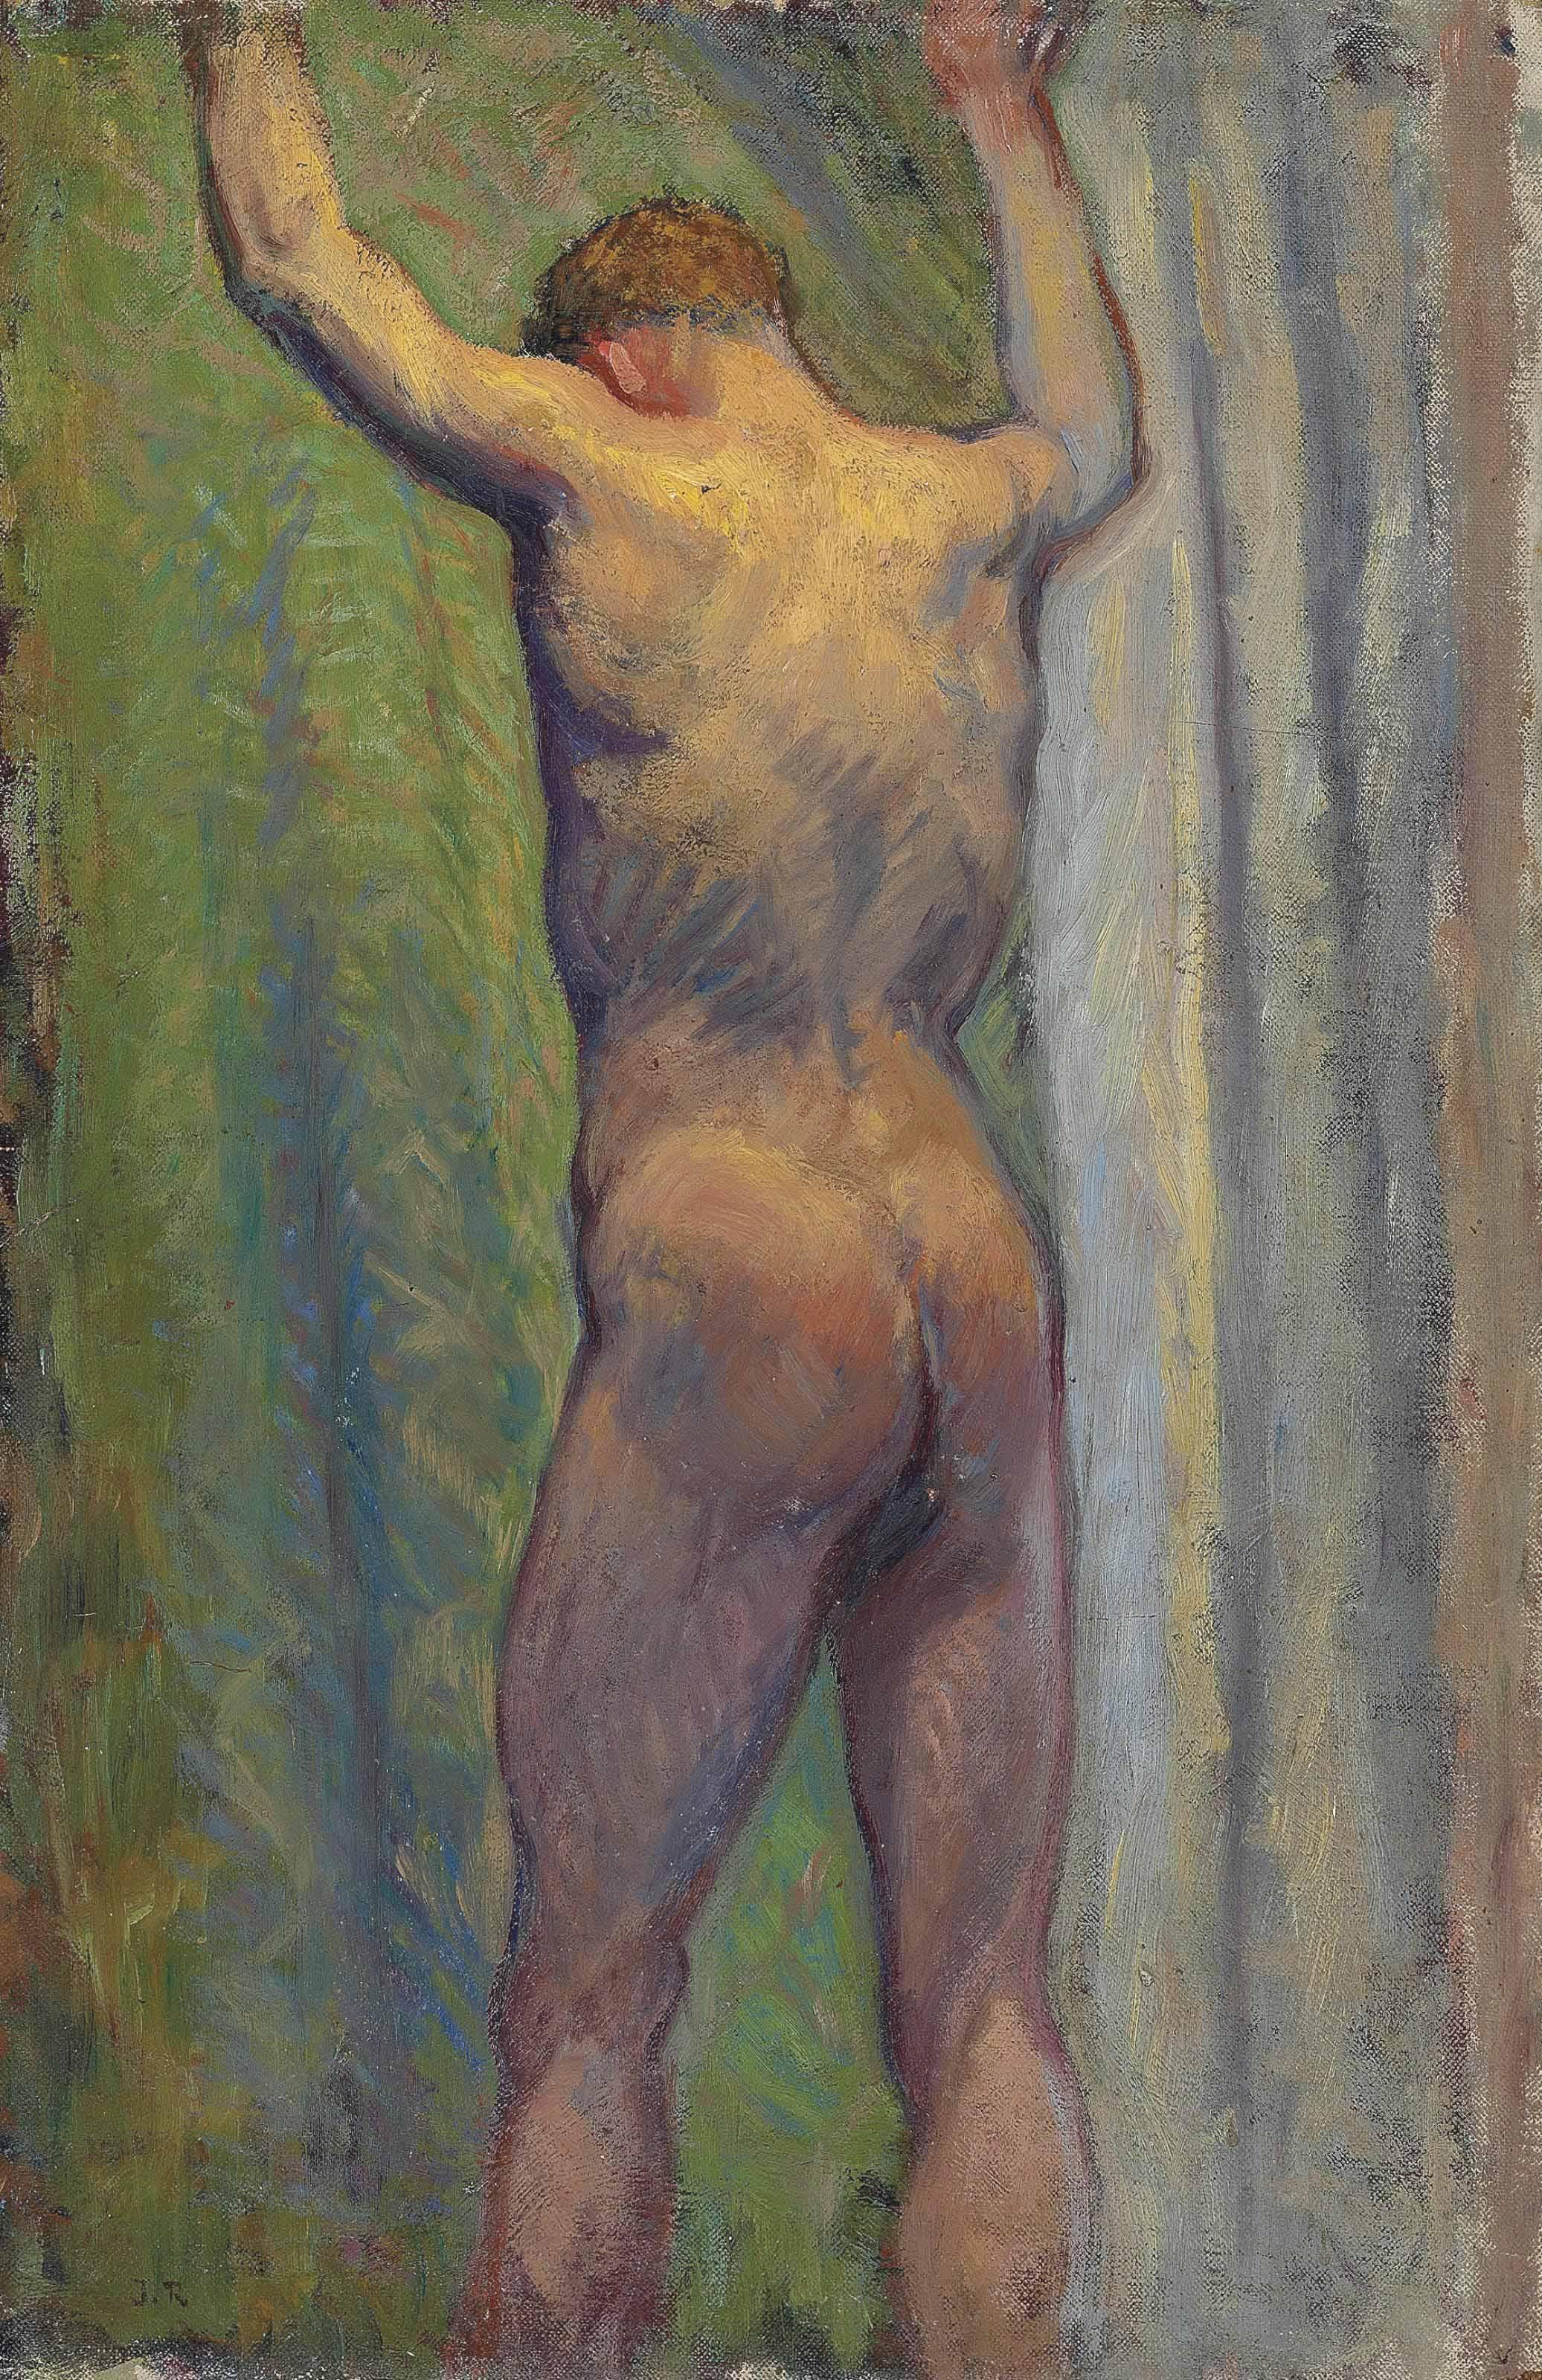 Standing male nude - an académie